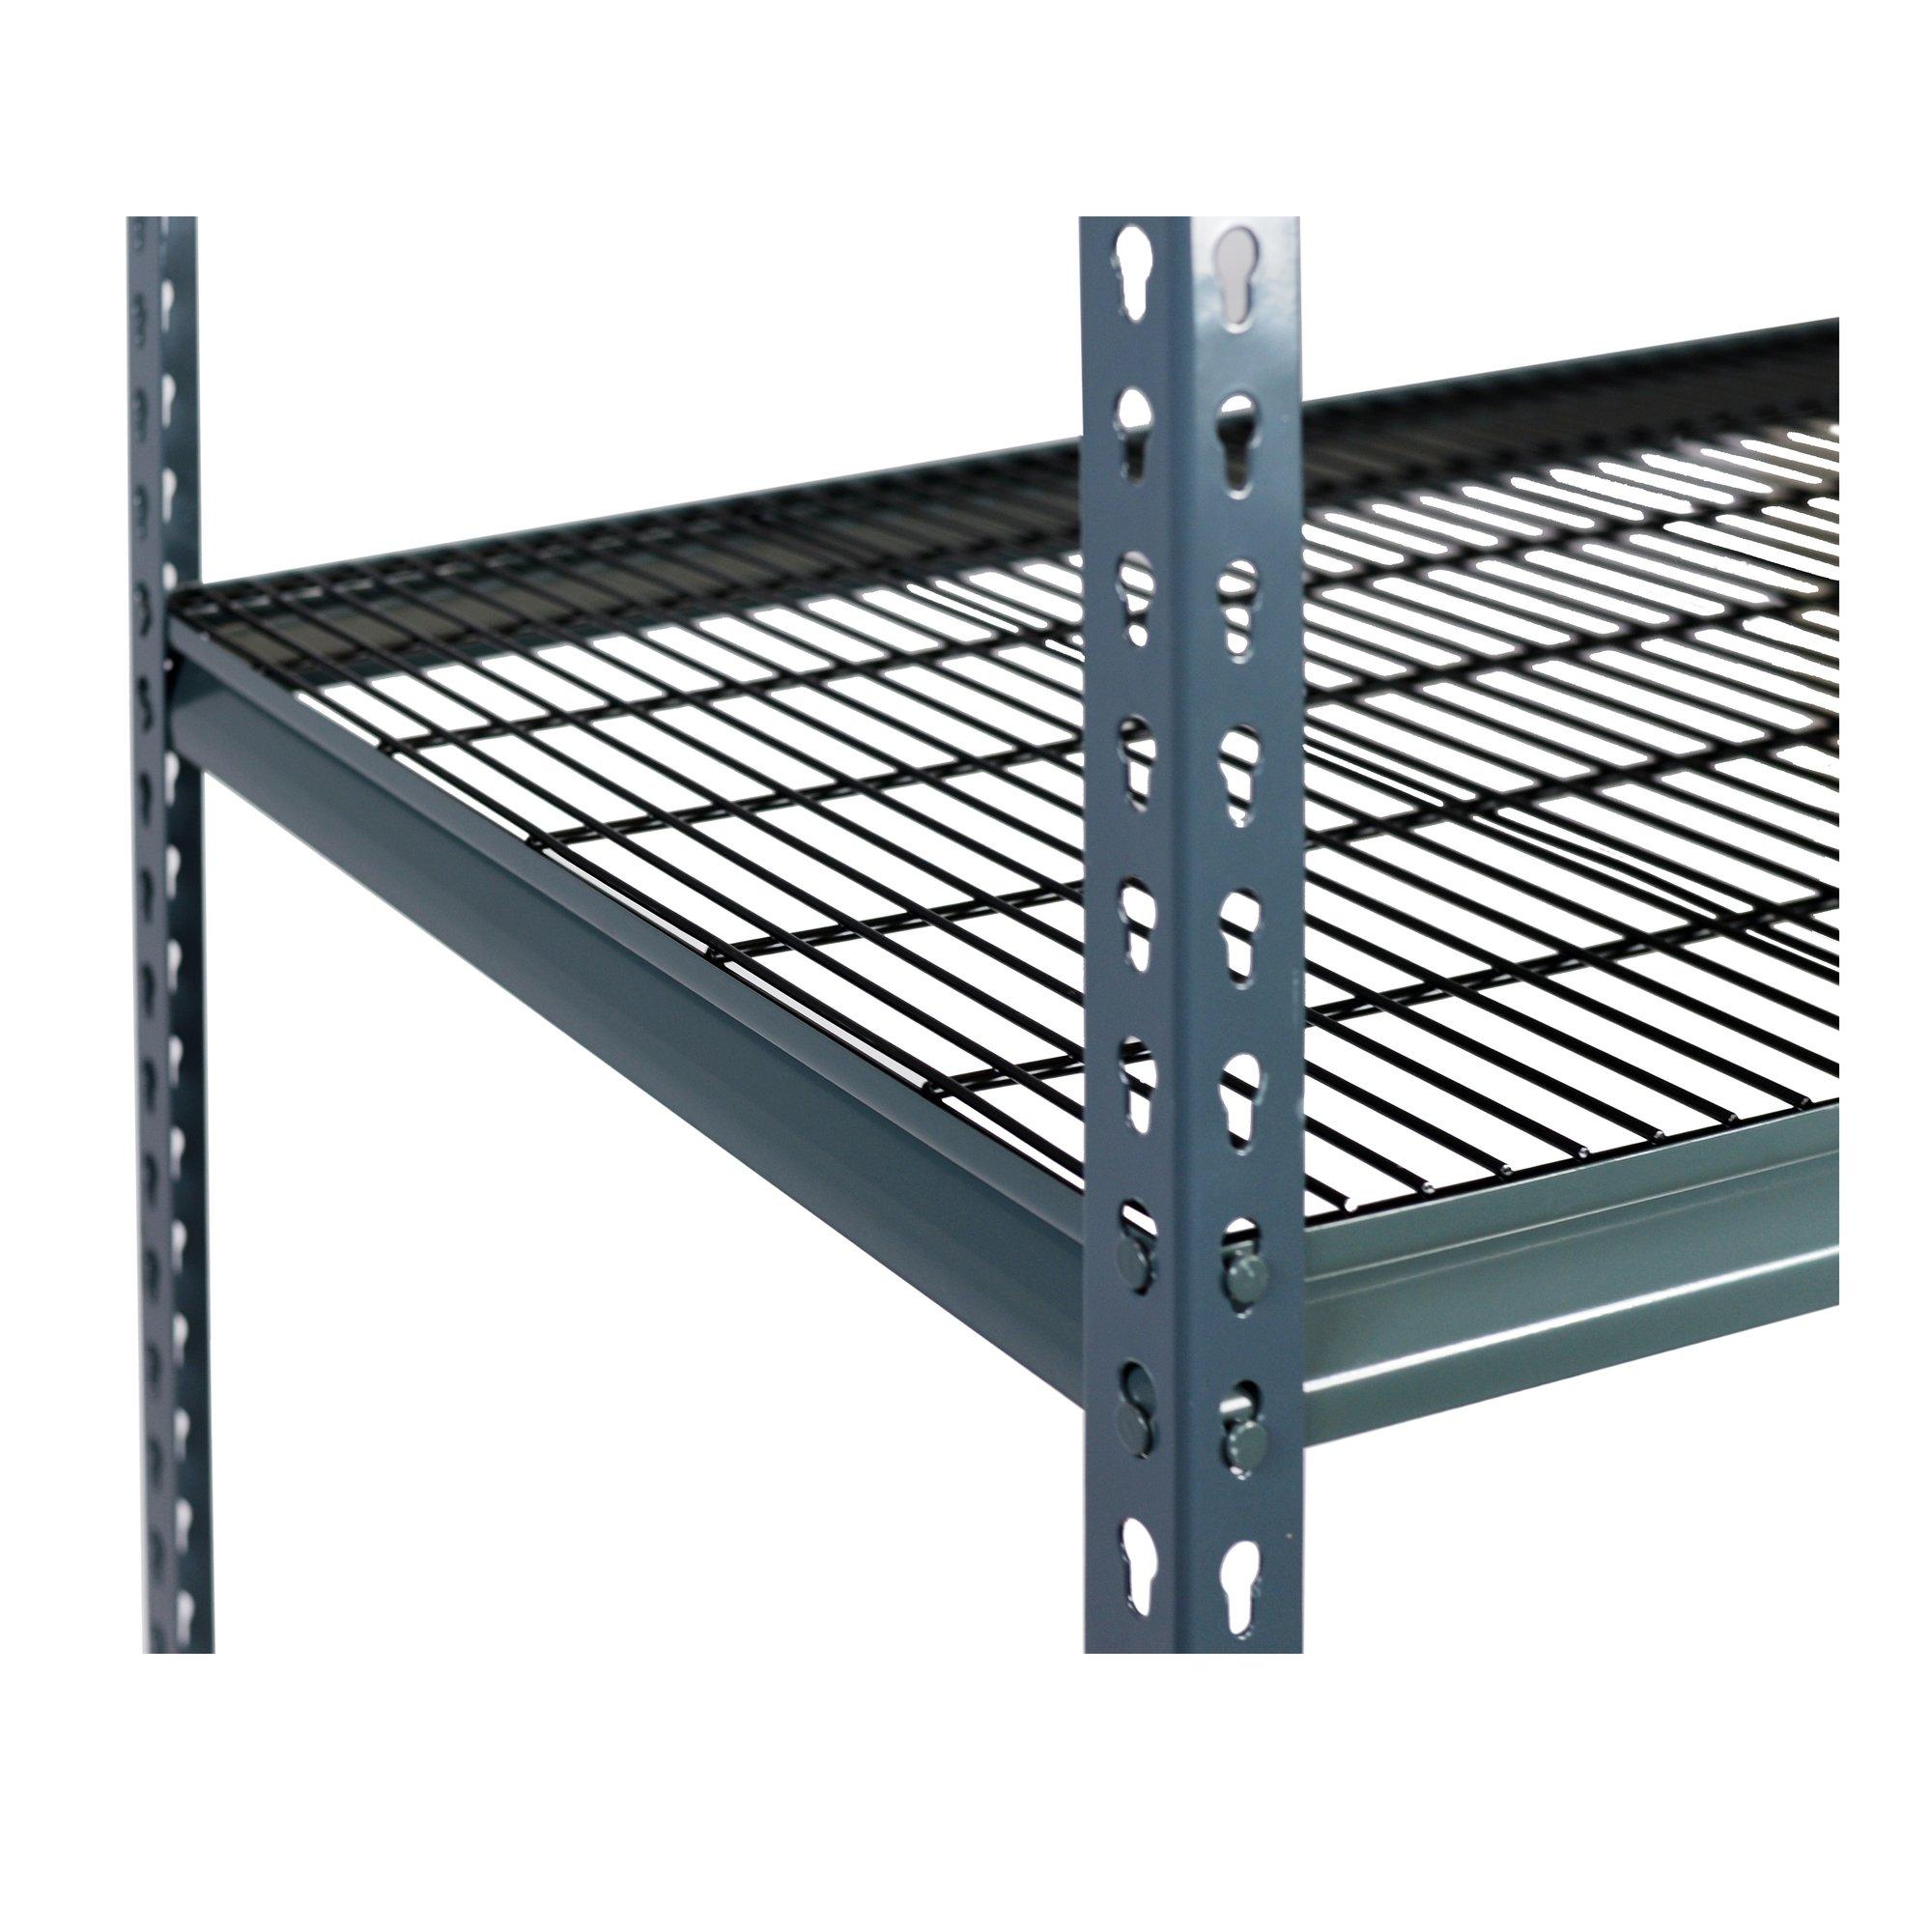 Storage Max Extra Shelf Garage Shelving Boltless, 48 x 18, Double Rivet Z-Beams, Wire Mesh